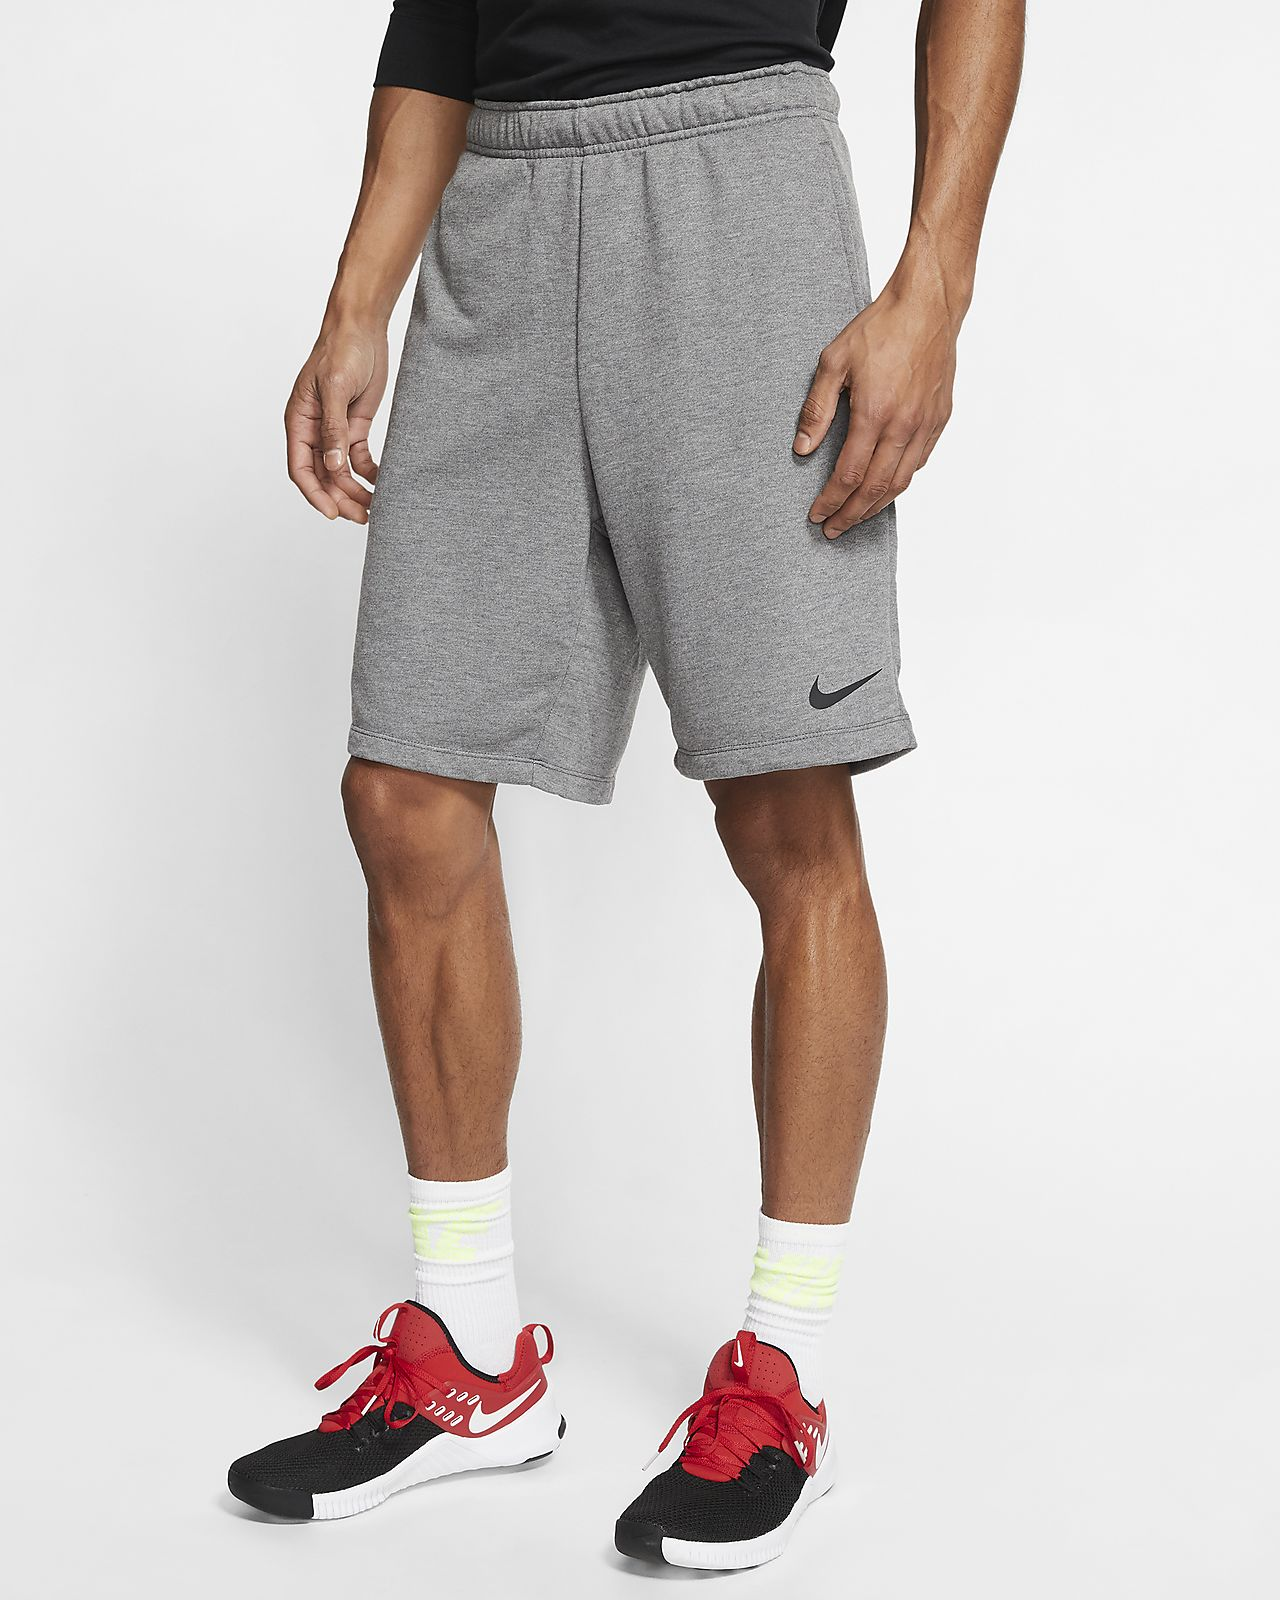 Shorts da training in fleece Nike Dri-FIT - Uomo